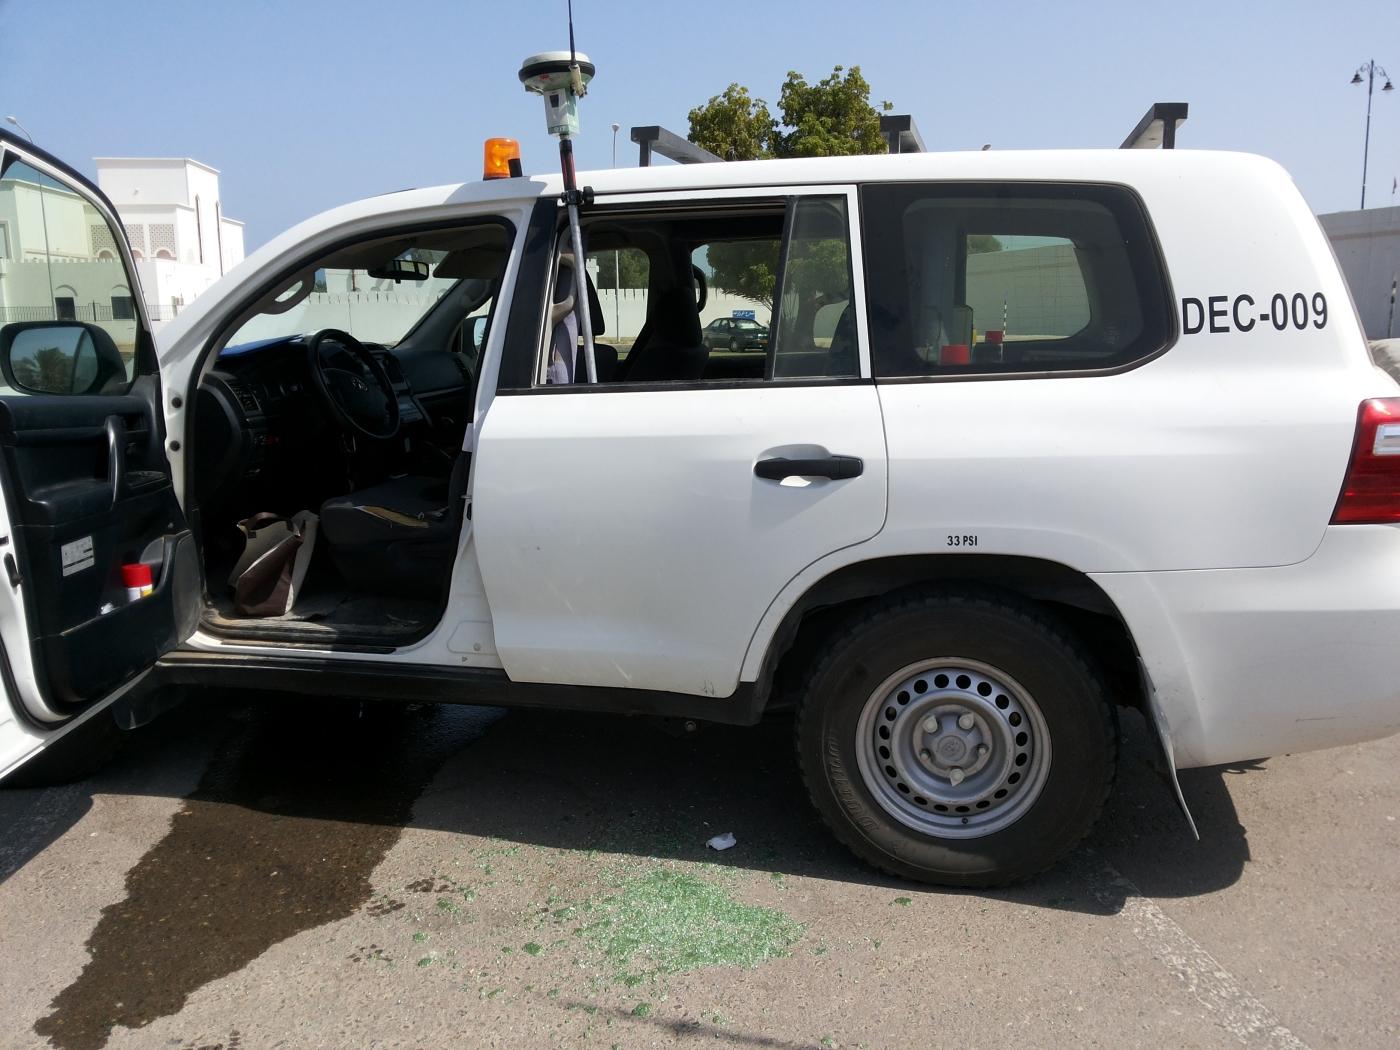 Leica Viva GPS accident